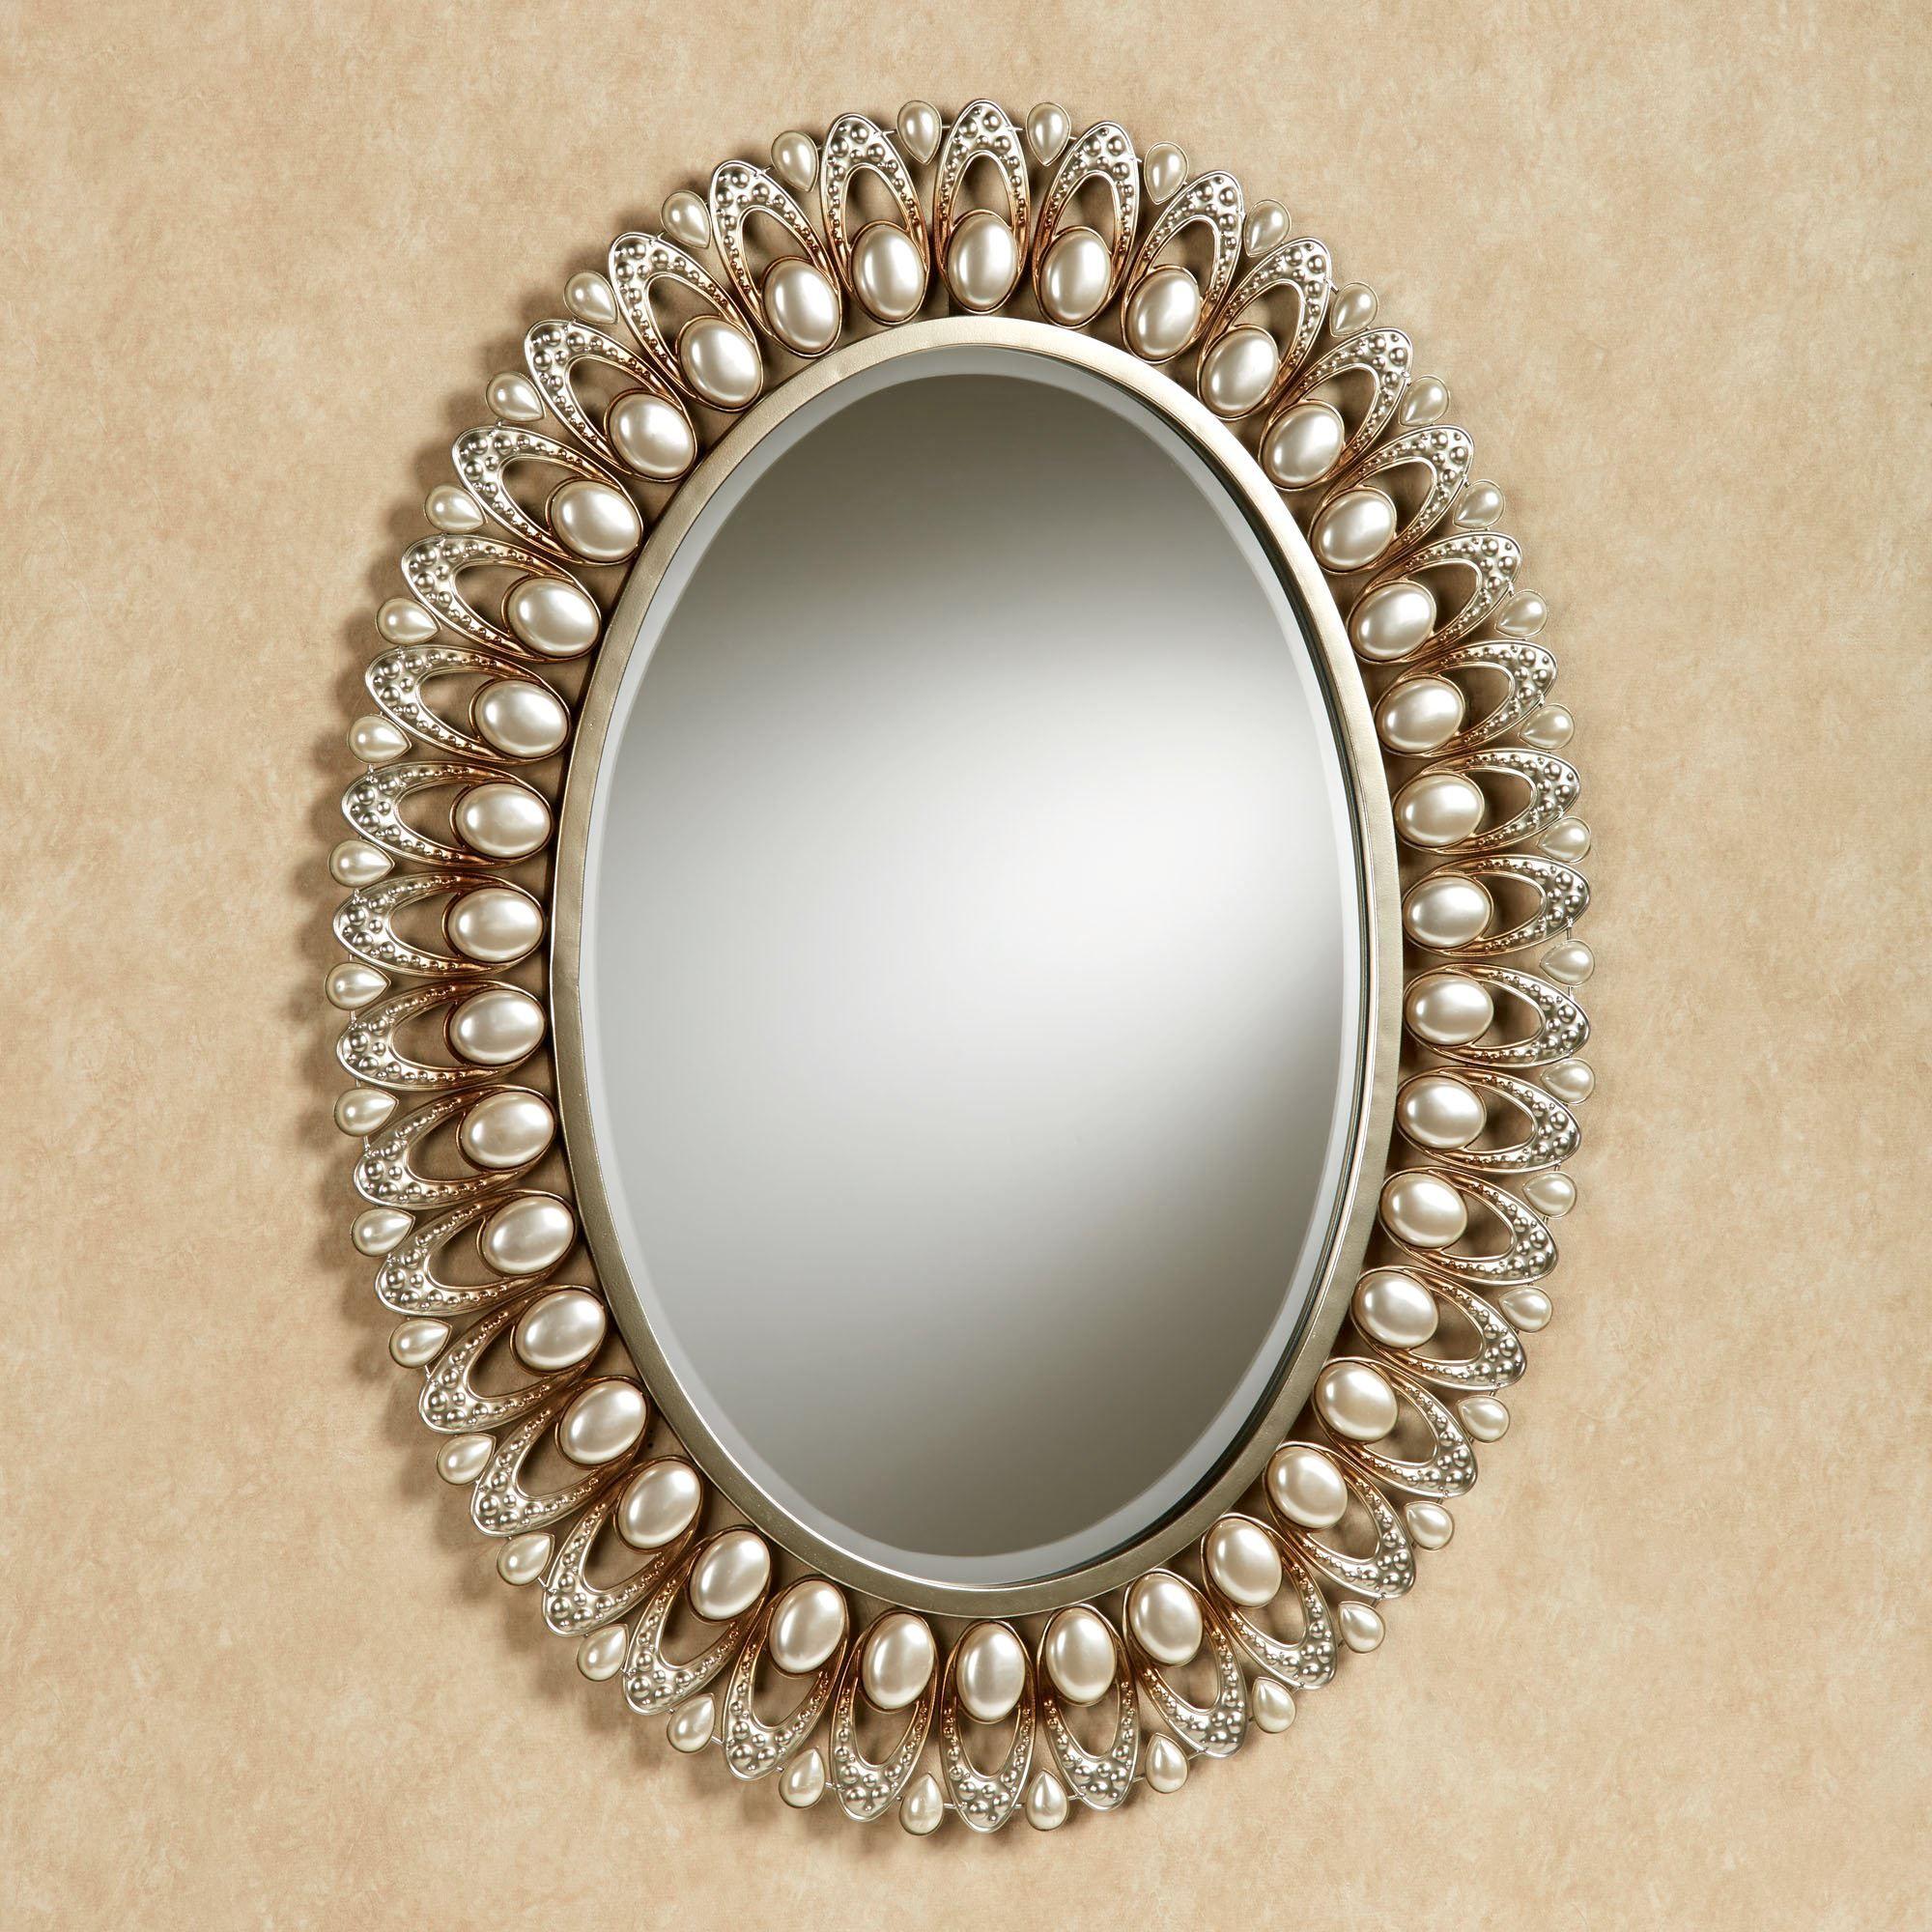 Julietta Pearl Oval Wall Mirror   Aynalar   Pinterest